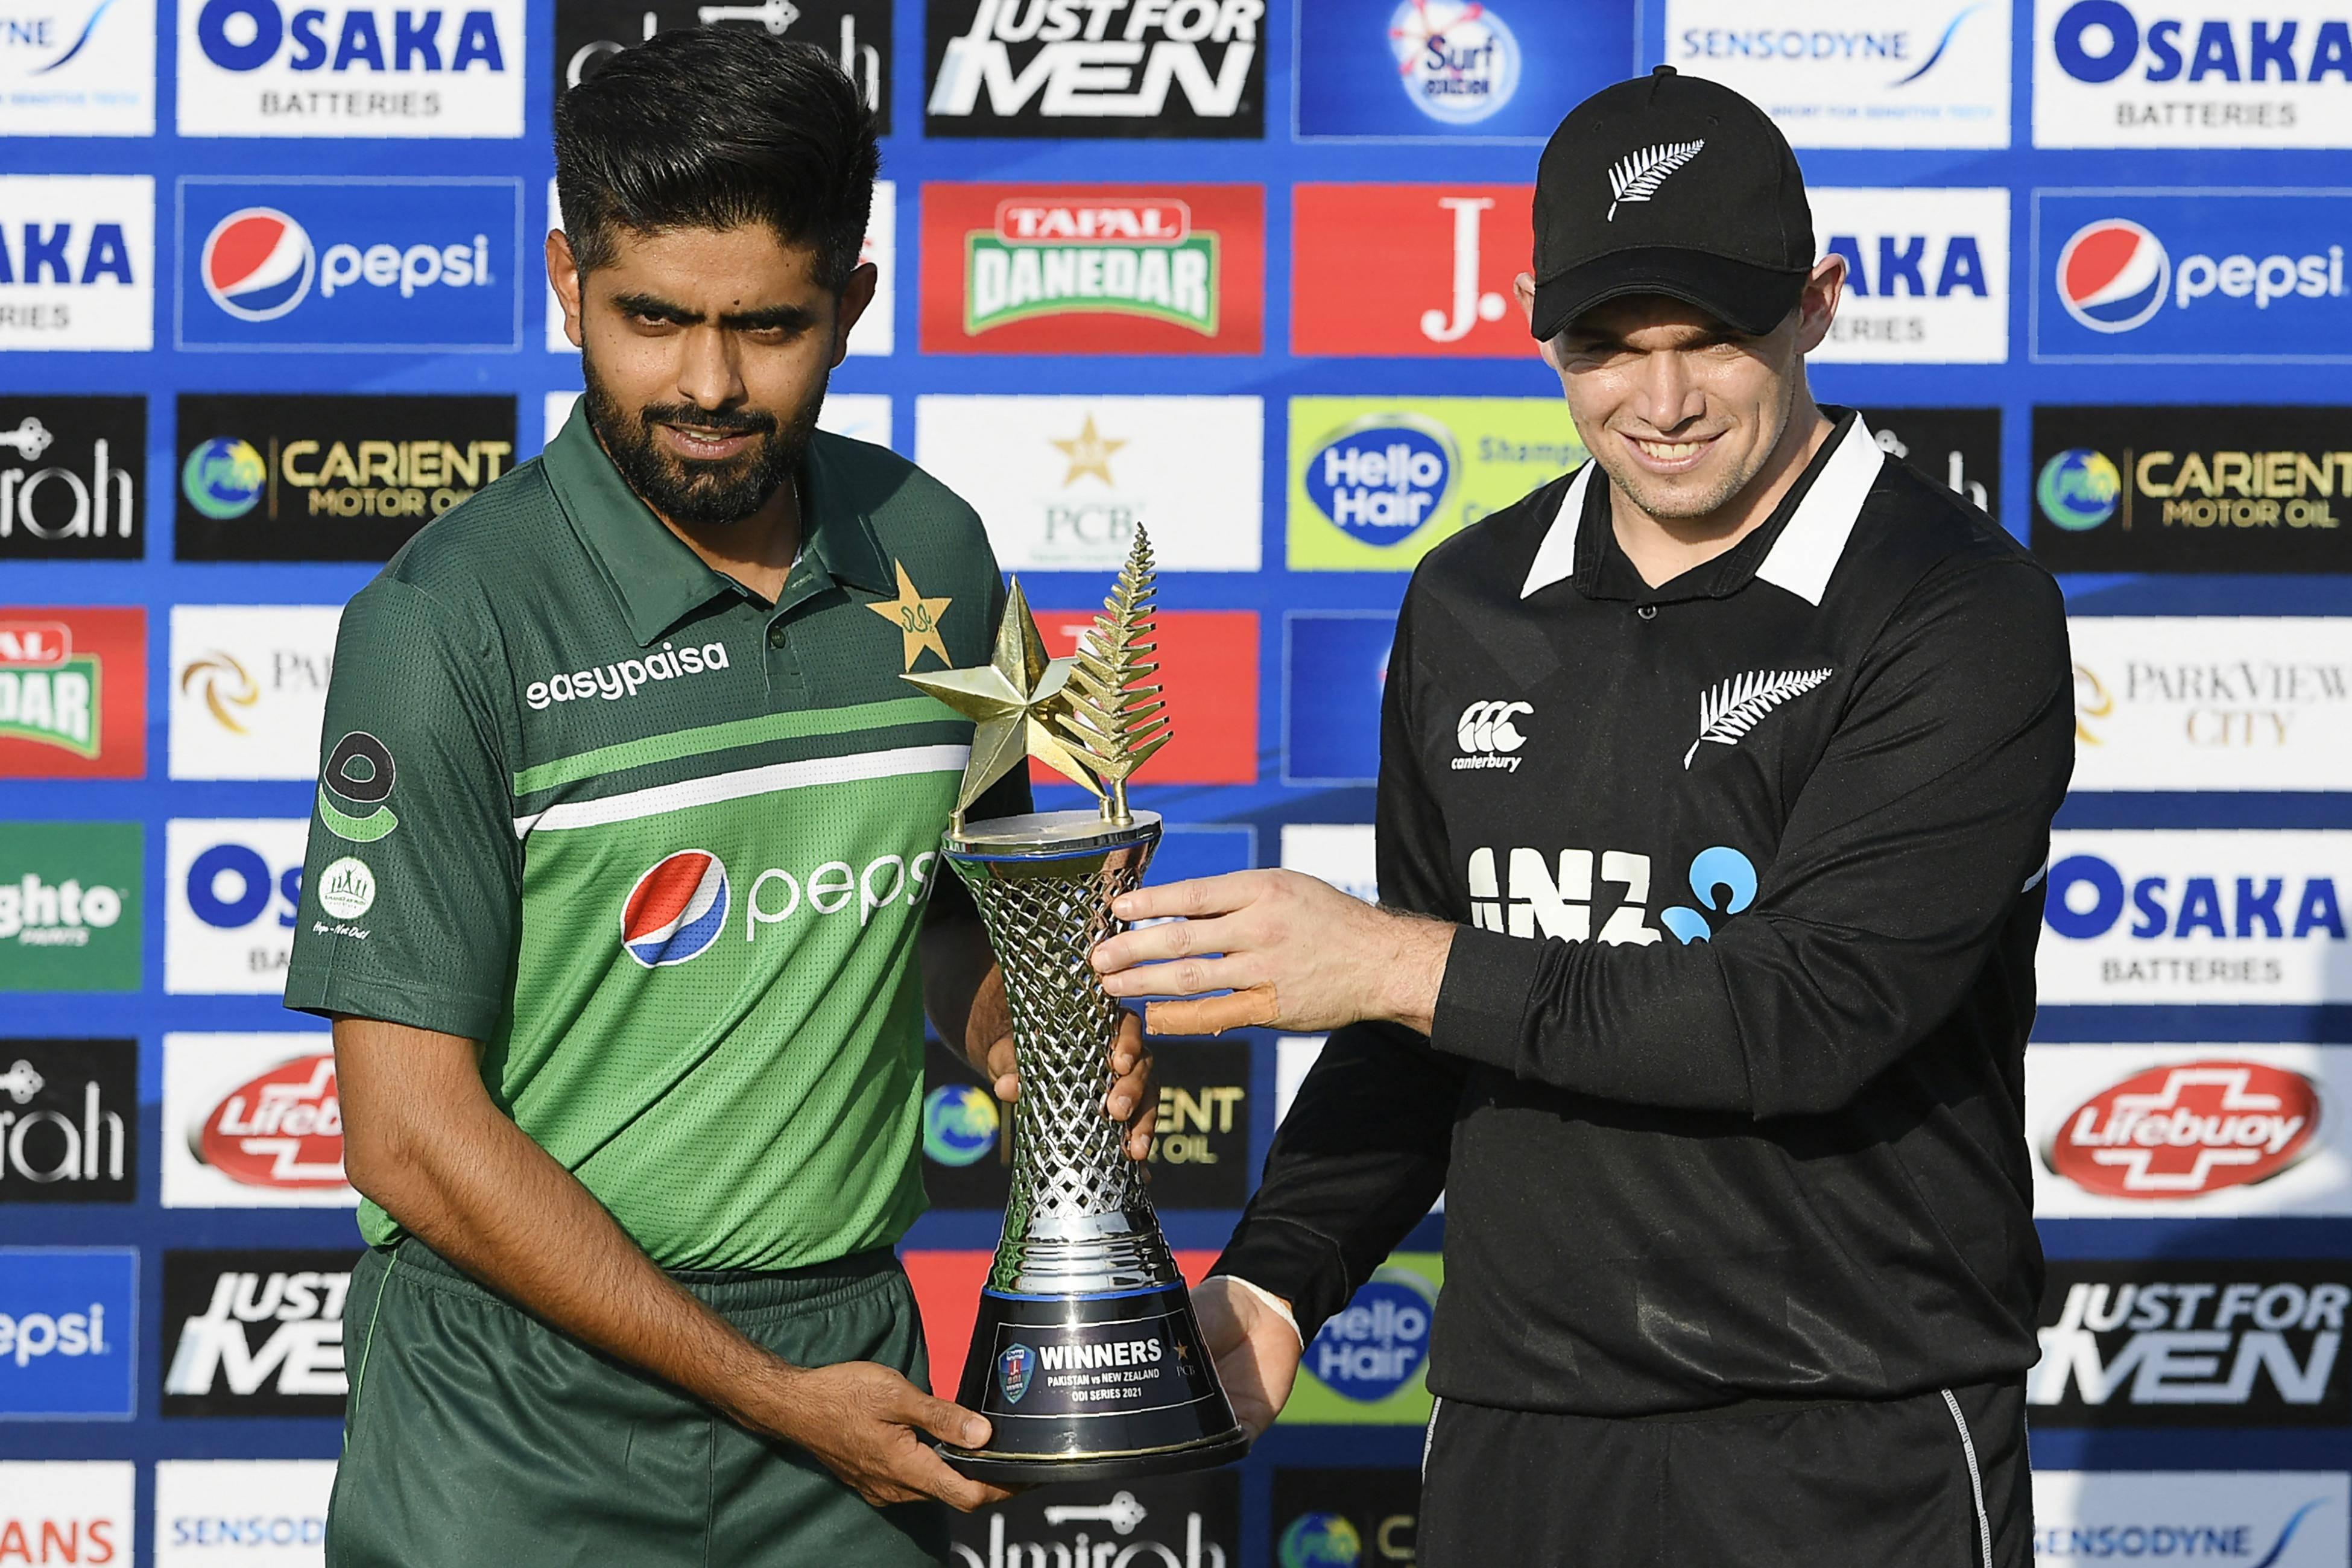 Pakistan-NZ series postponed due to security concerns